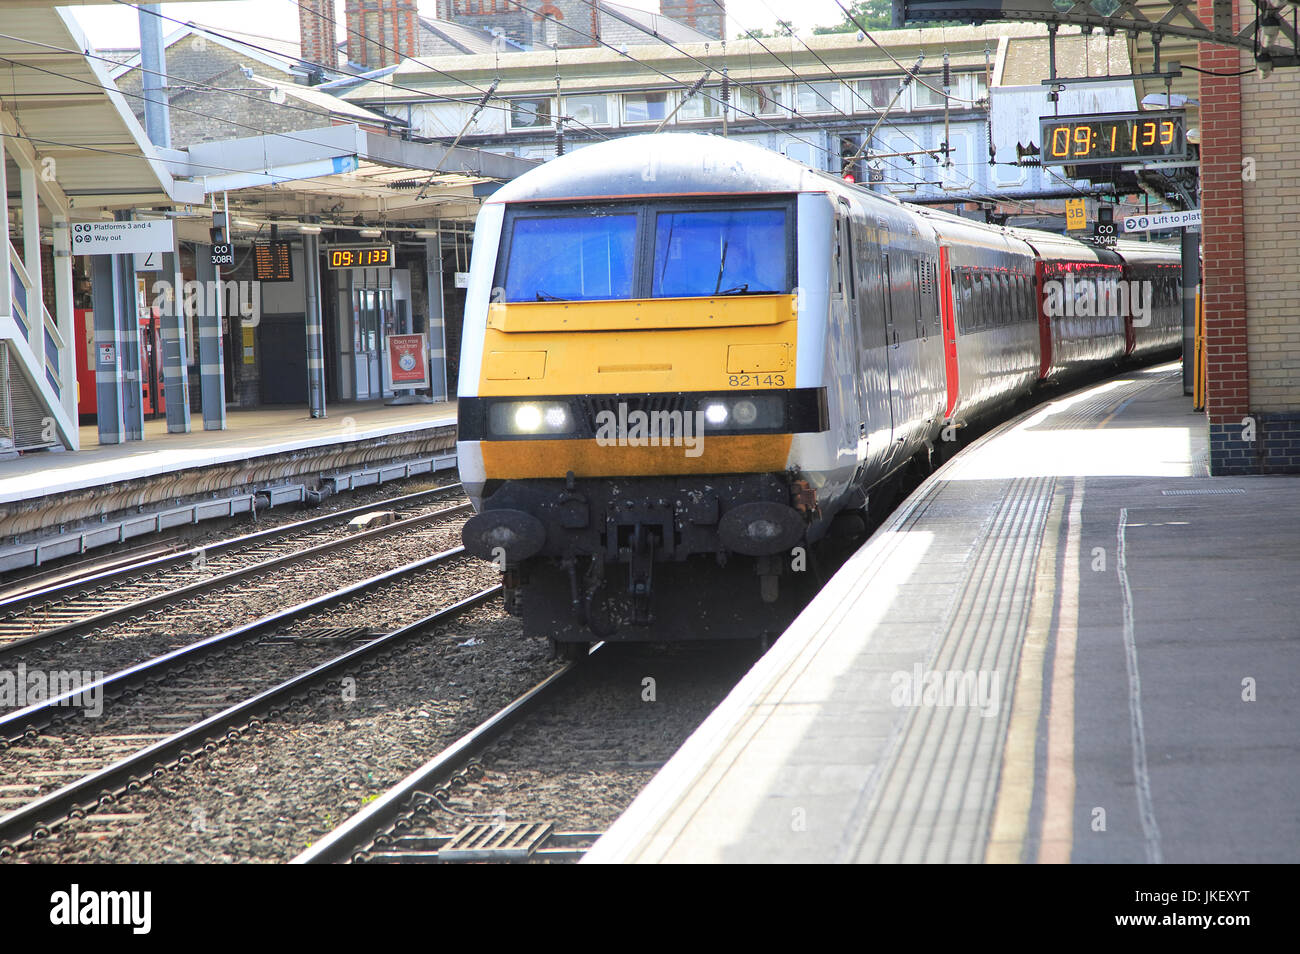 Greater Anglia mainline train at platform Ipswich railway station, Suffolk, England, UK - Stock Image